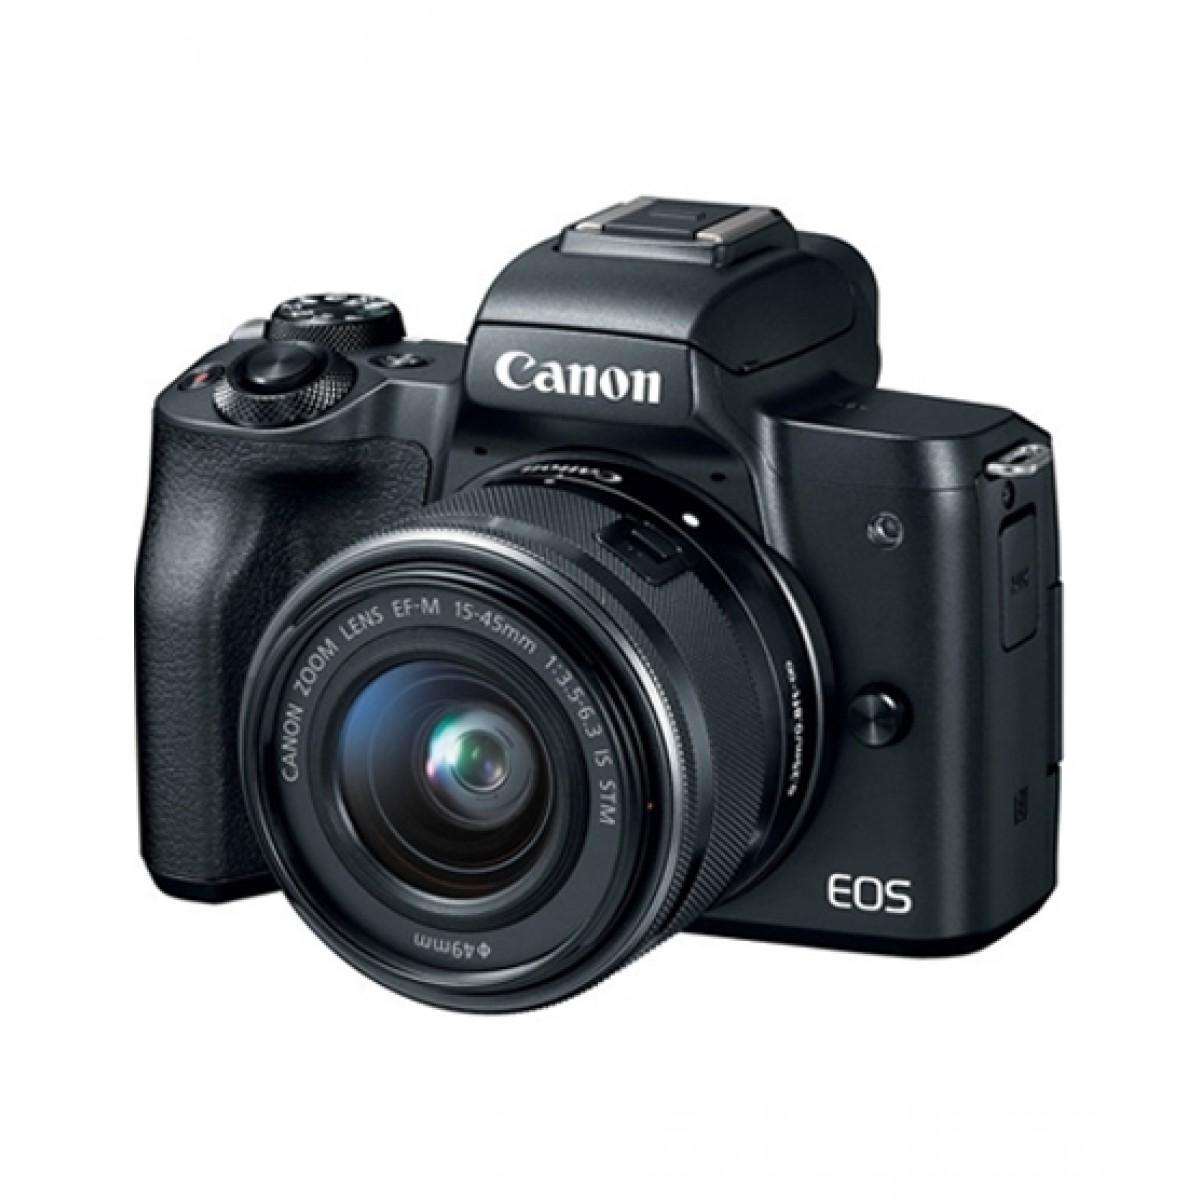 Canon EOS M50 Mirrorless Digital Camera With 15-45mm Lens Black - MBM Warranty